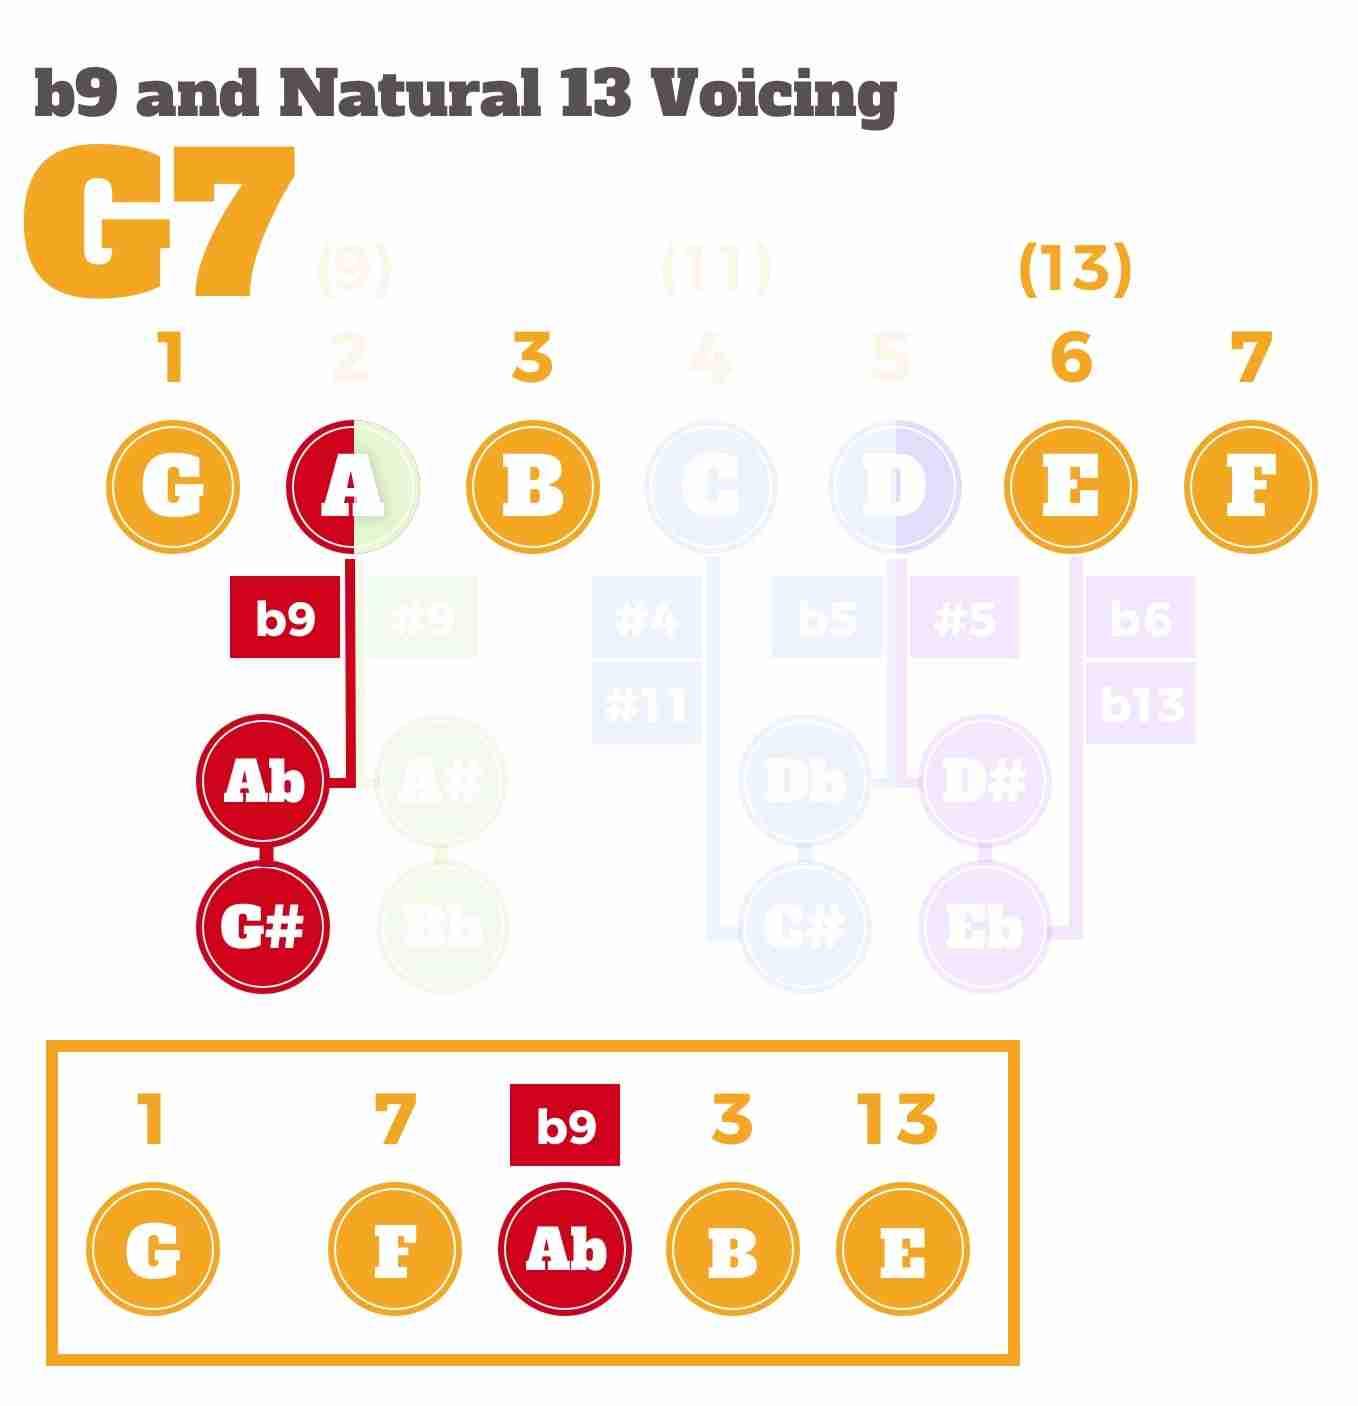 Voicing V7b9 13